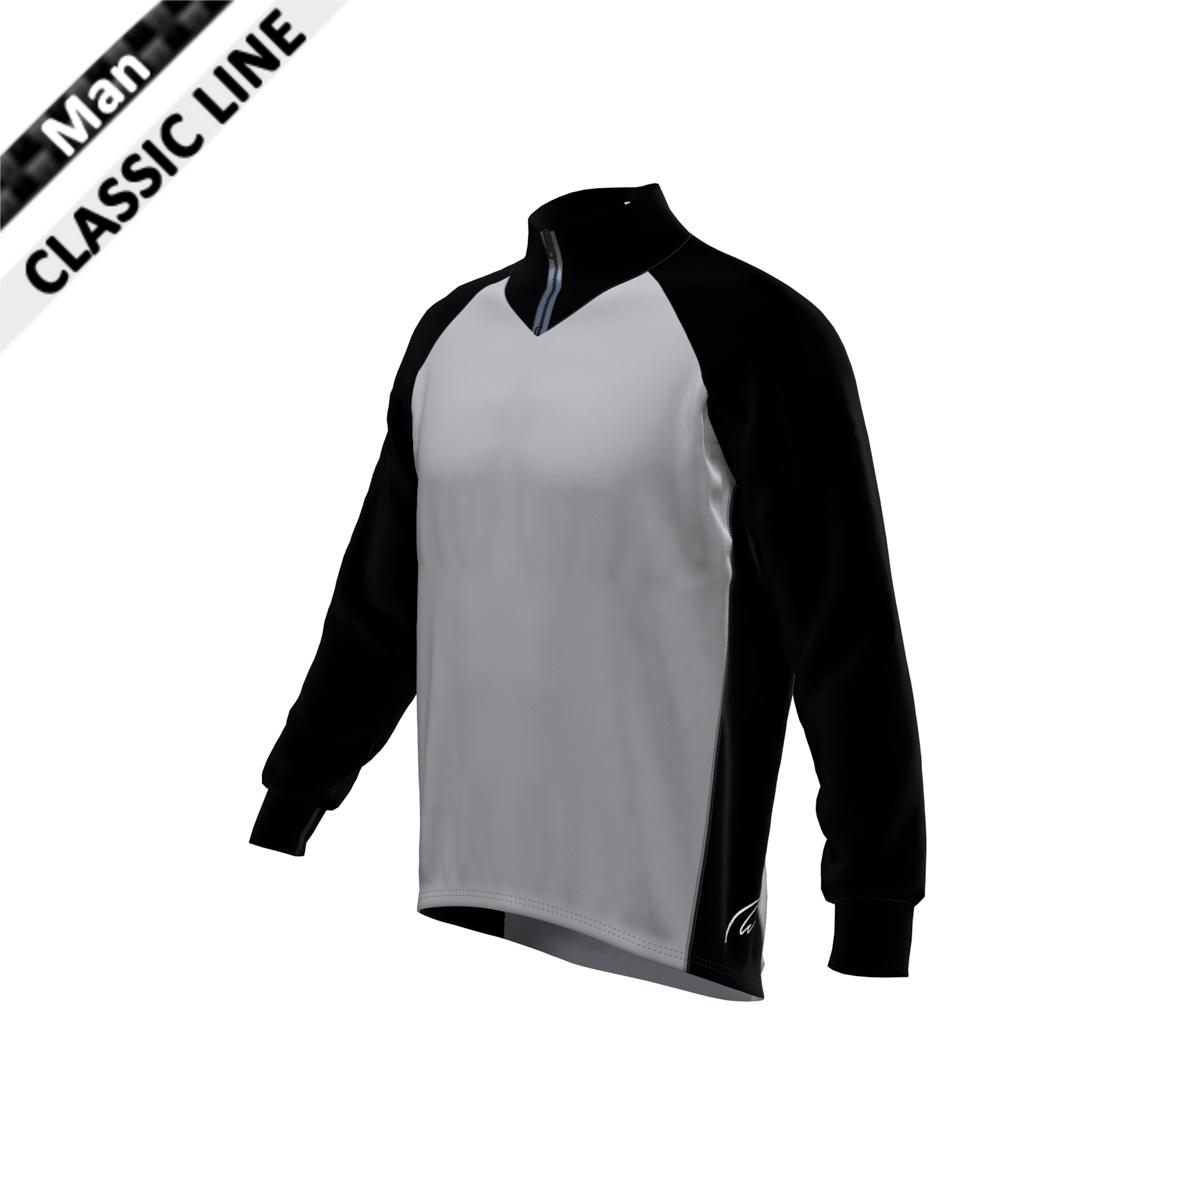 Tasmania Gamex Jacket - schwarz